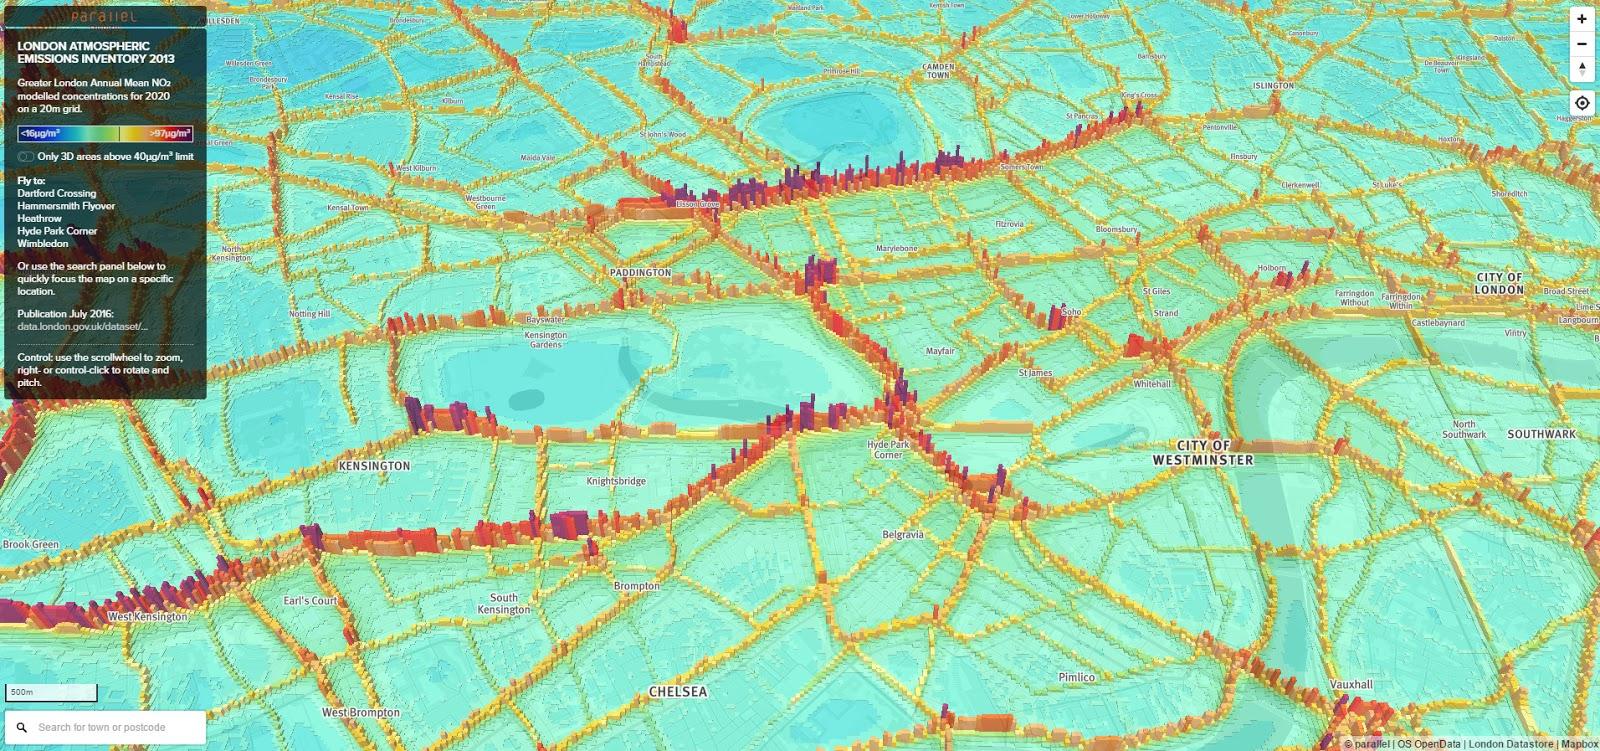 London atmospheric emissions inventory